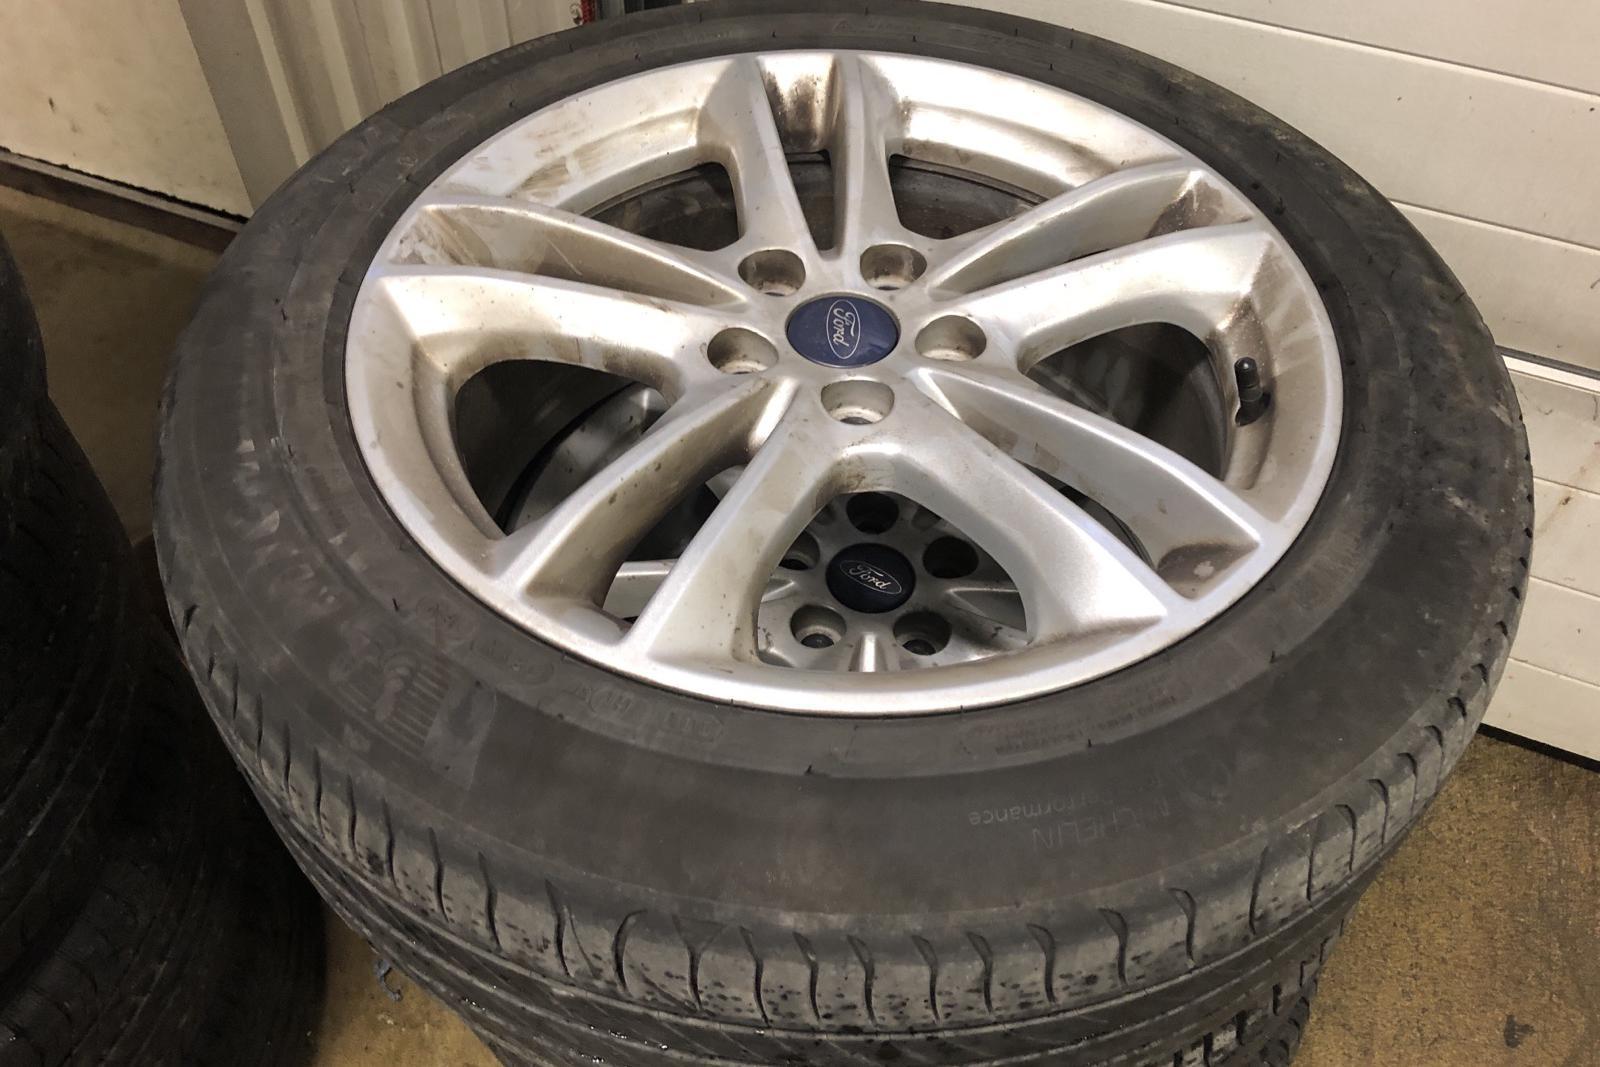 Ford Mondeo 2.0 TDCi AWD Kombi (180hk) - 10 550 mil - Automat - vit - 2016